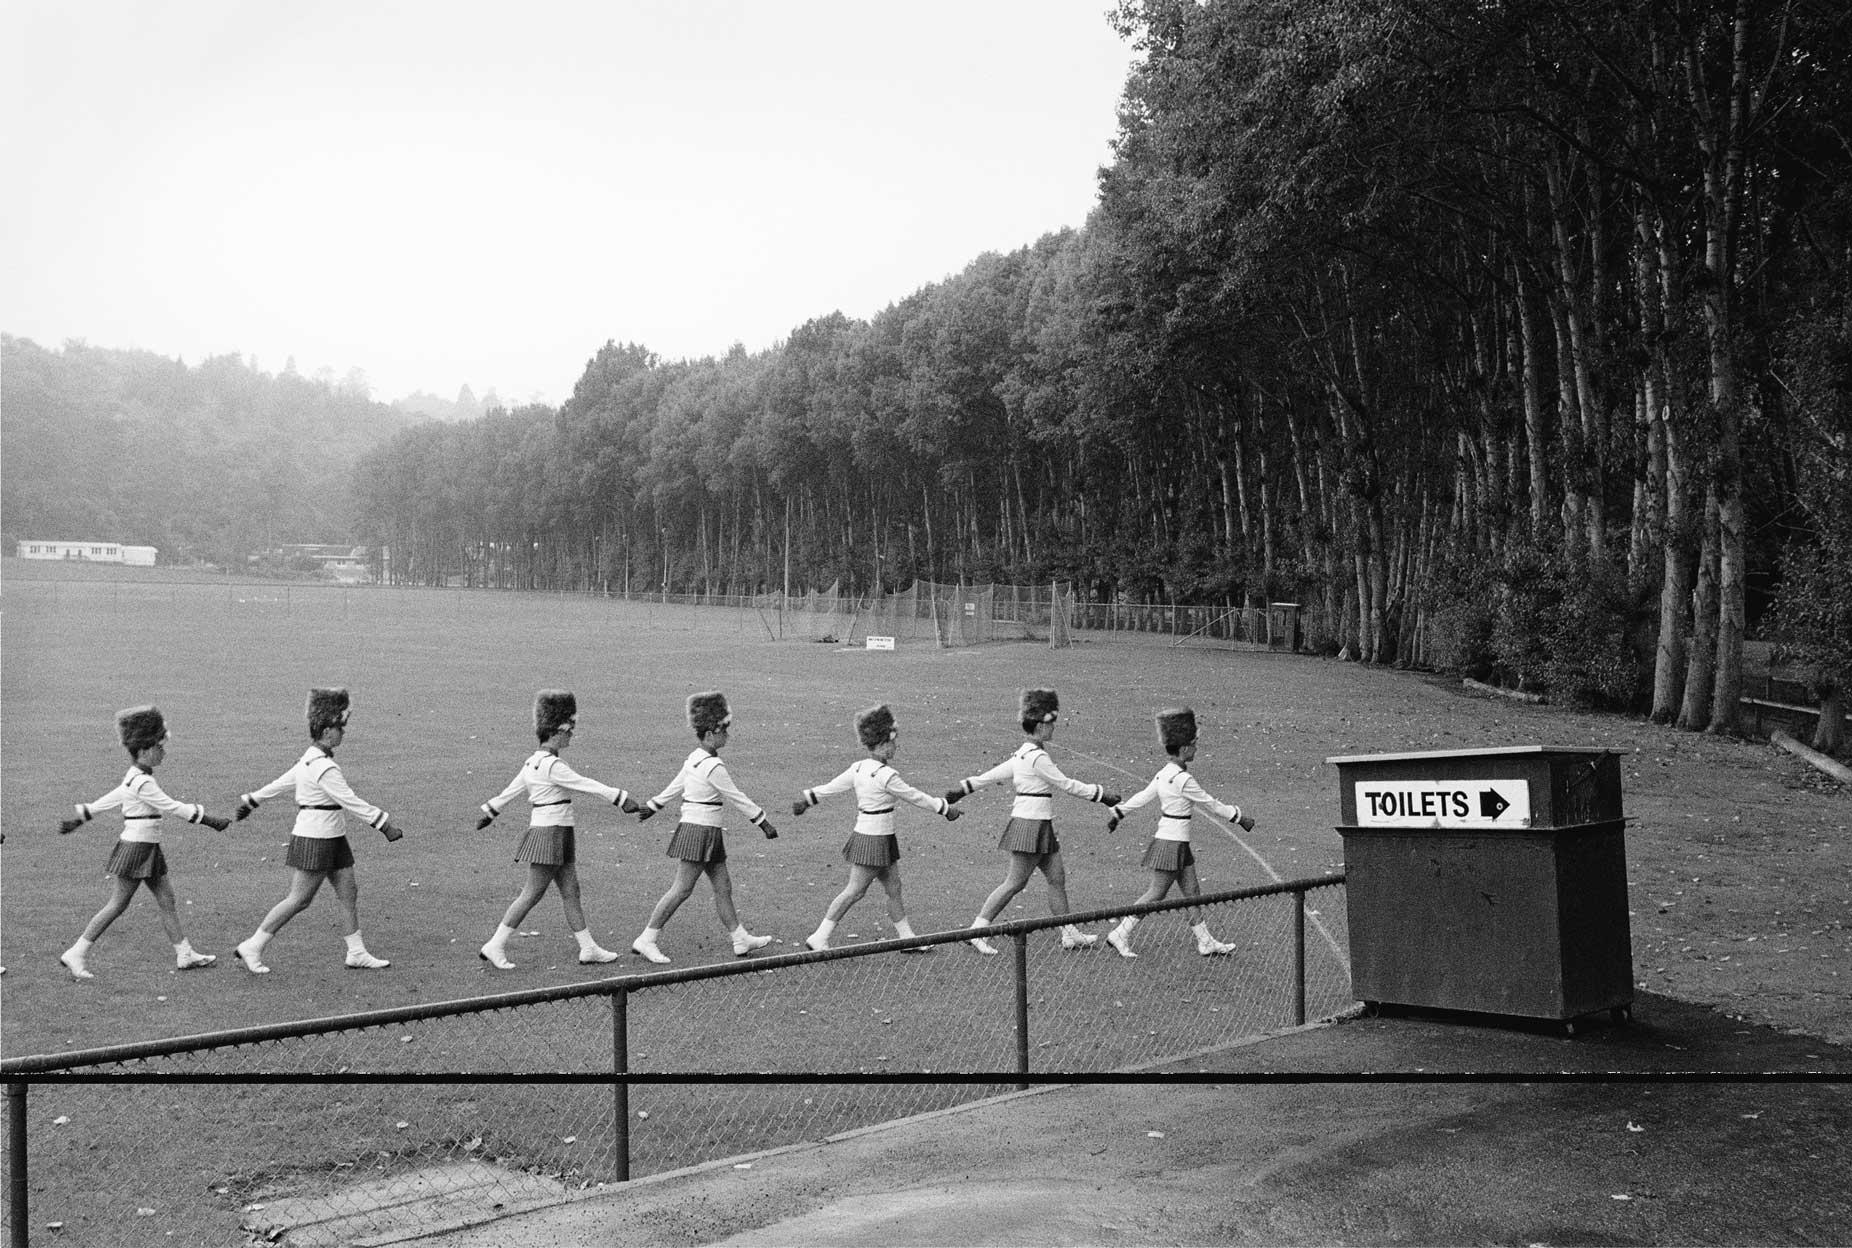 Marching team, Logan Park, Dunedin, 1991